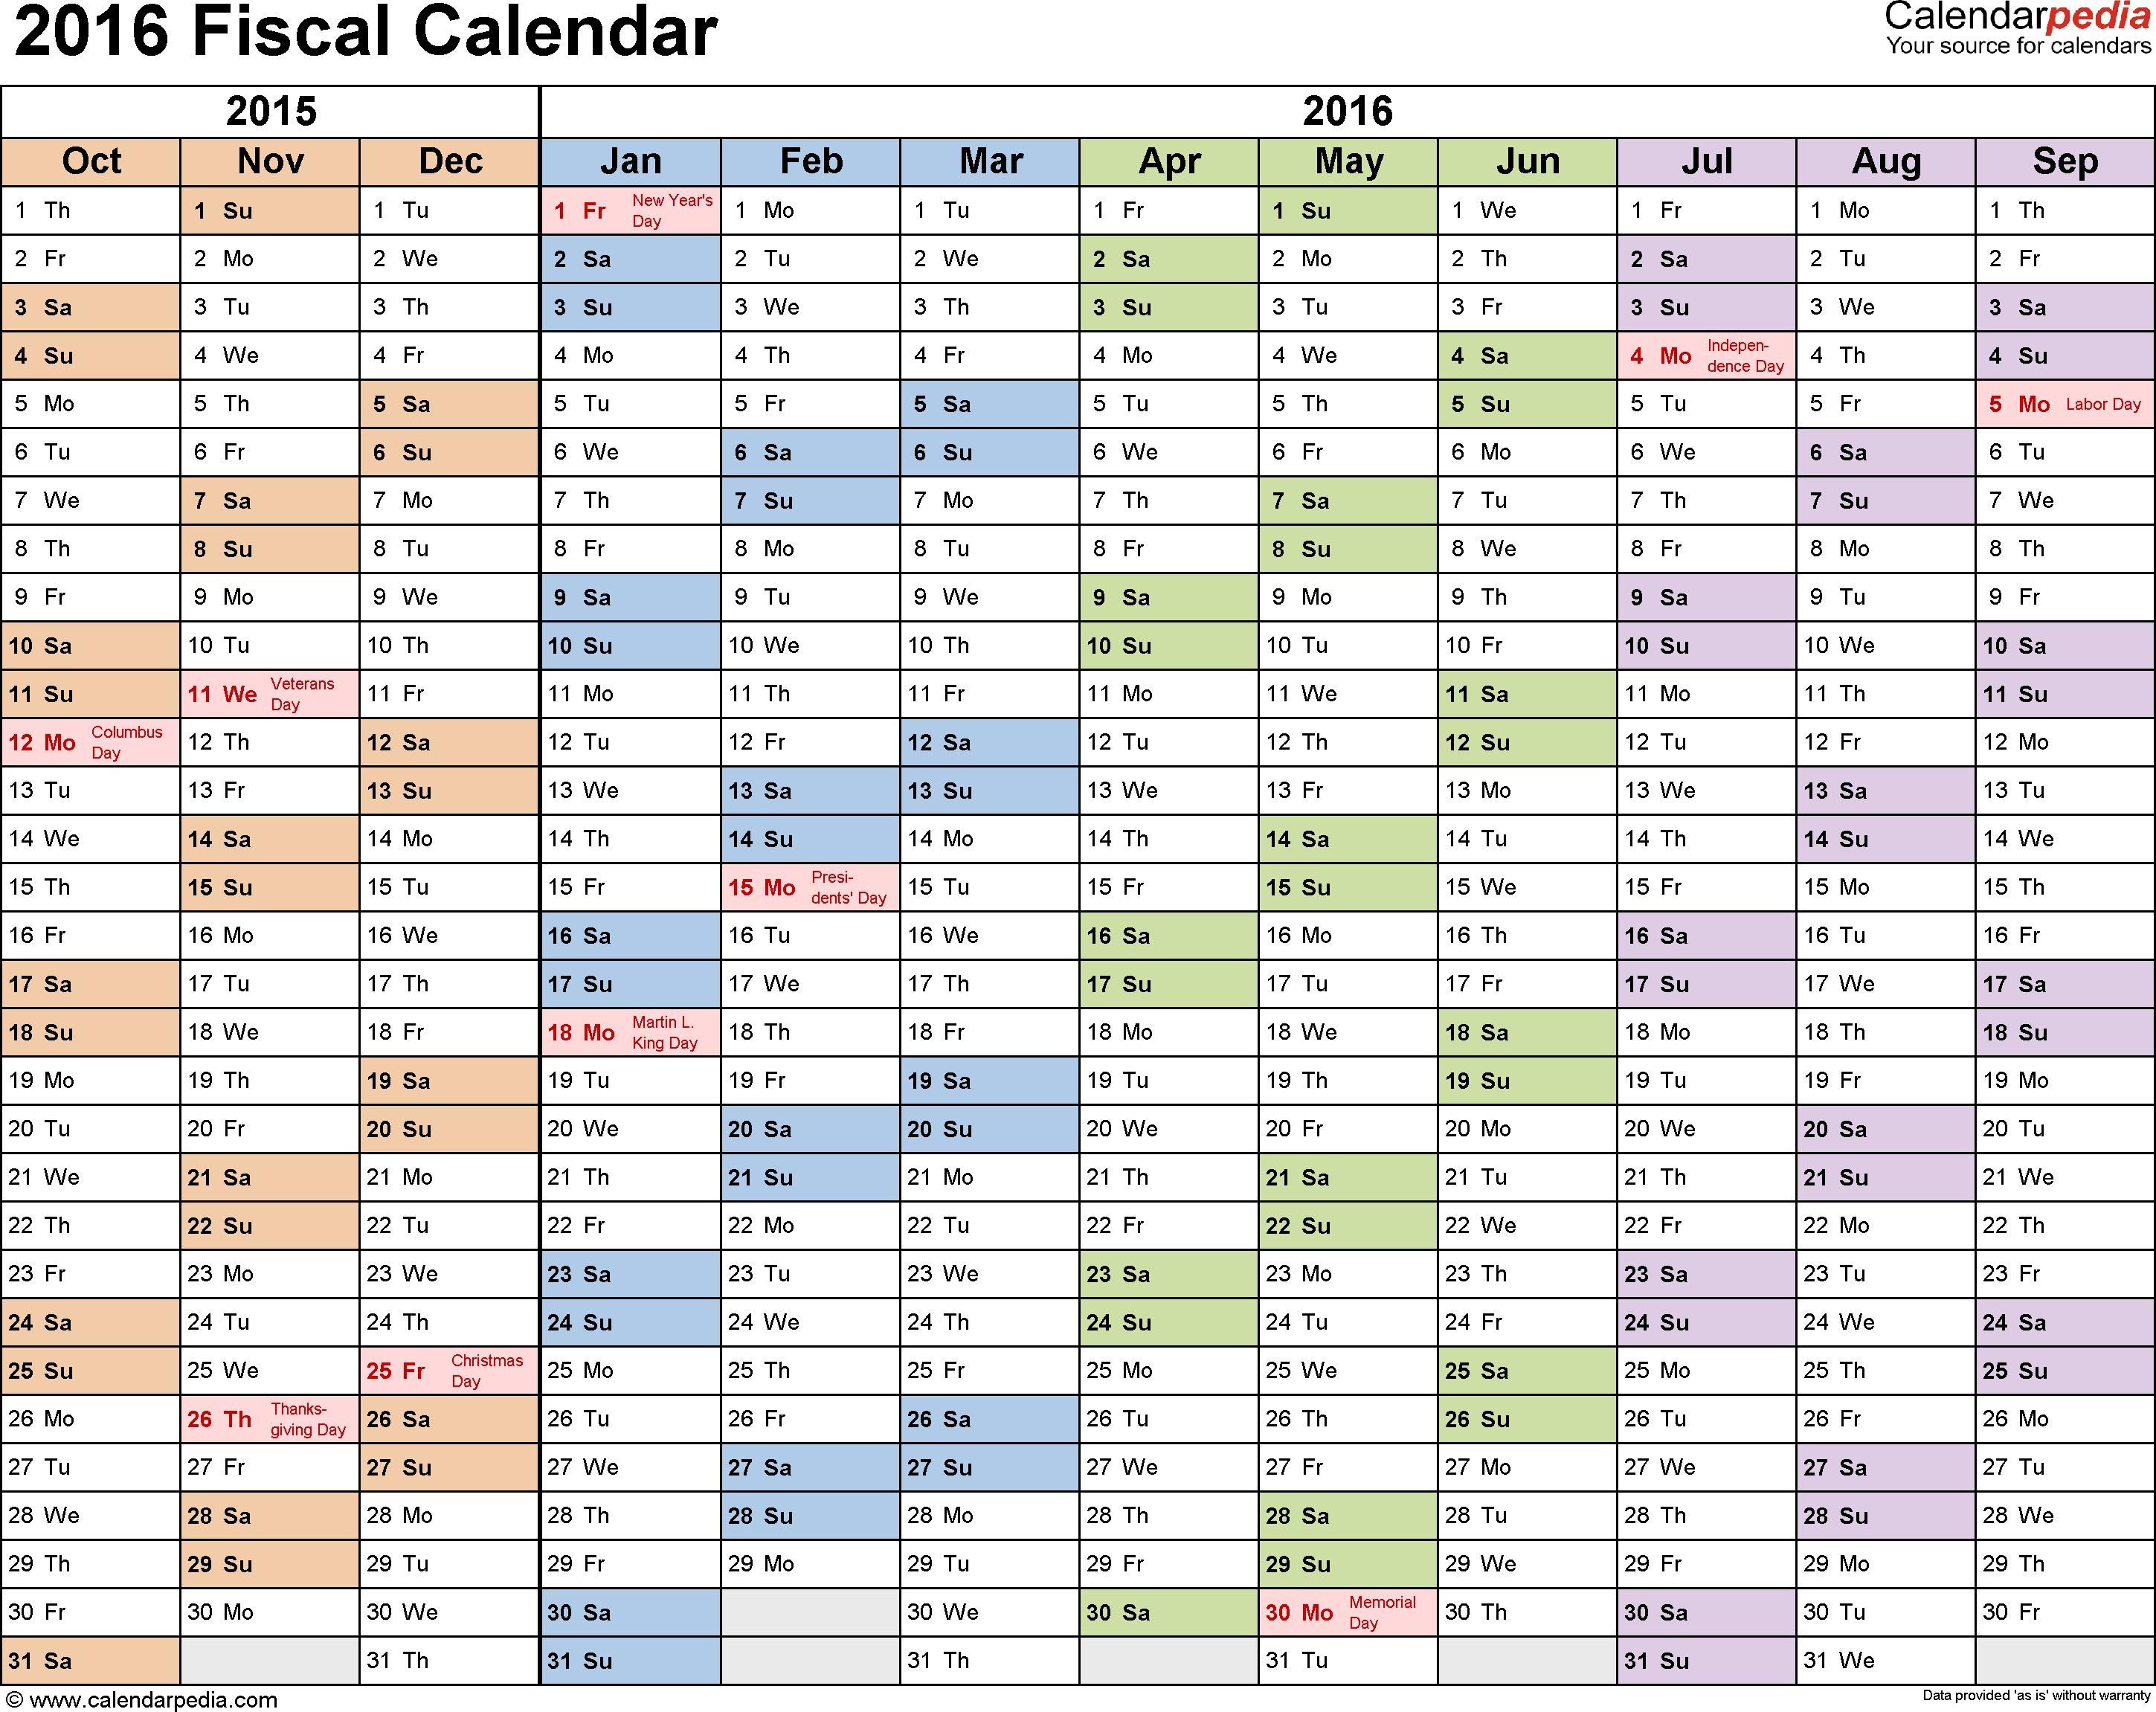 Fiscal Calendars 2016 As Free Printable Pdf Templates regarding Calendar Year Vs Fiscal Year